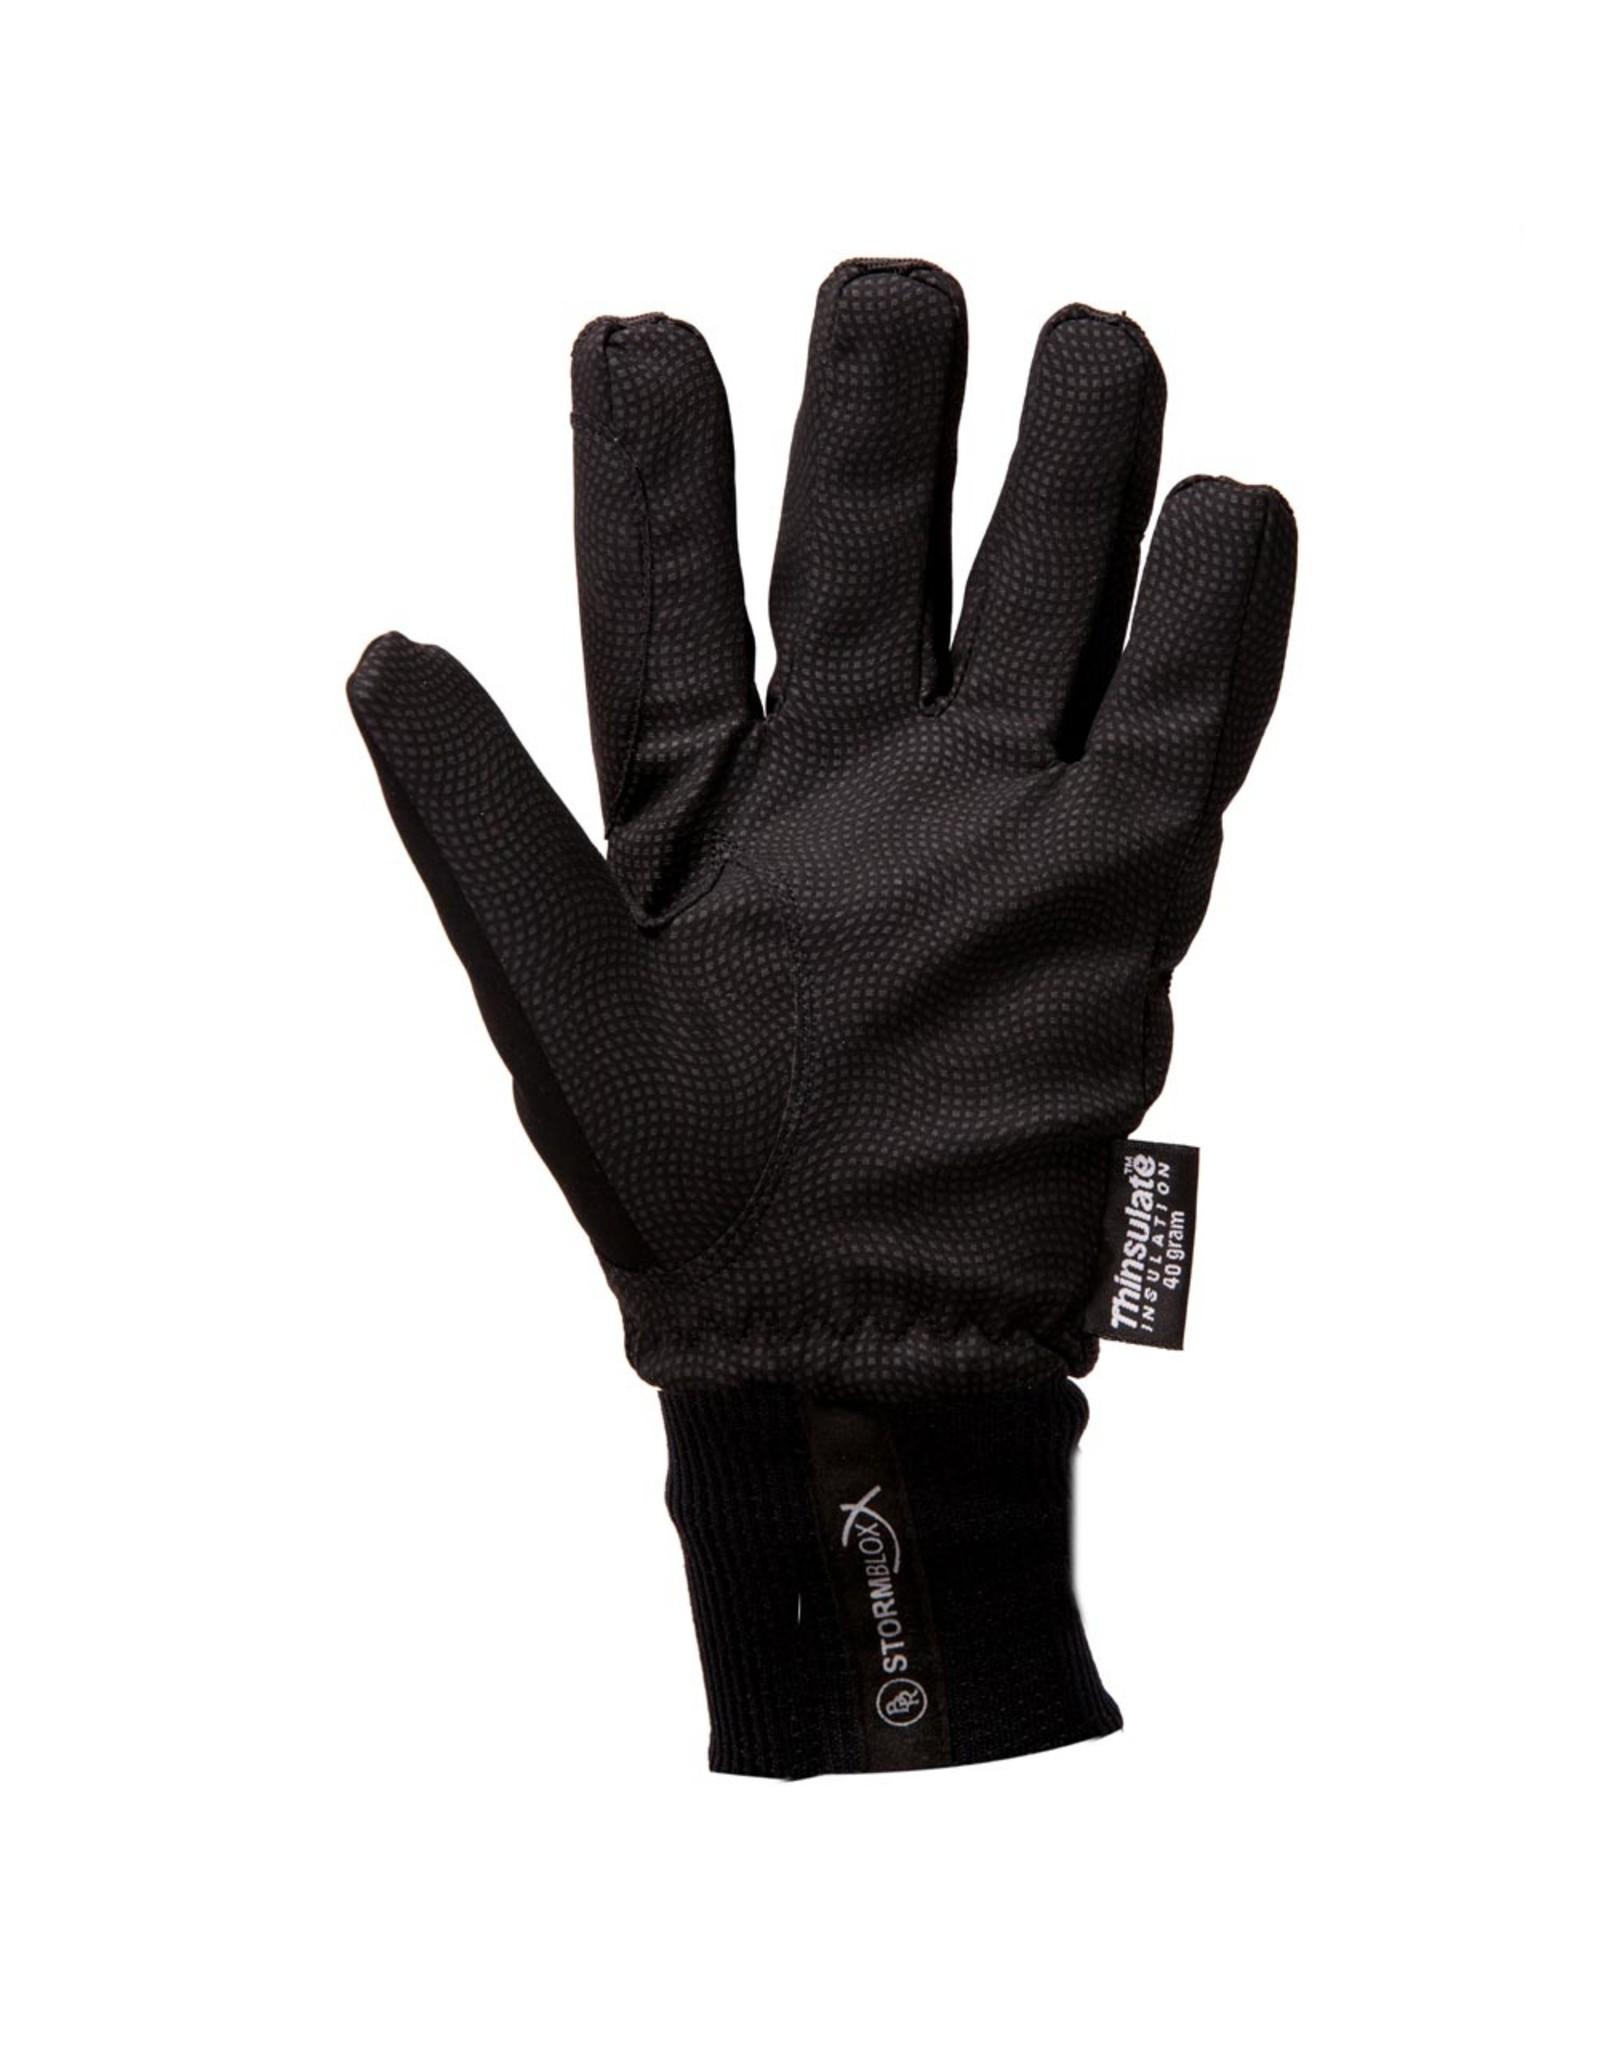 BR BR winterhandschoenen StormBloxx Zwart